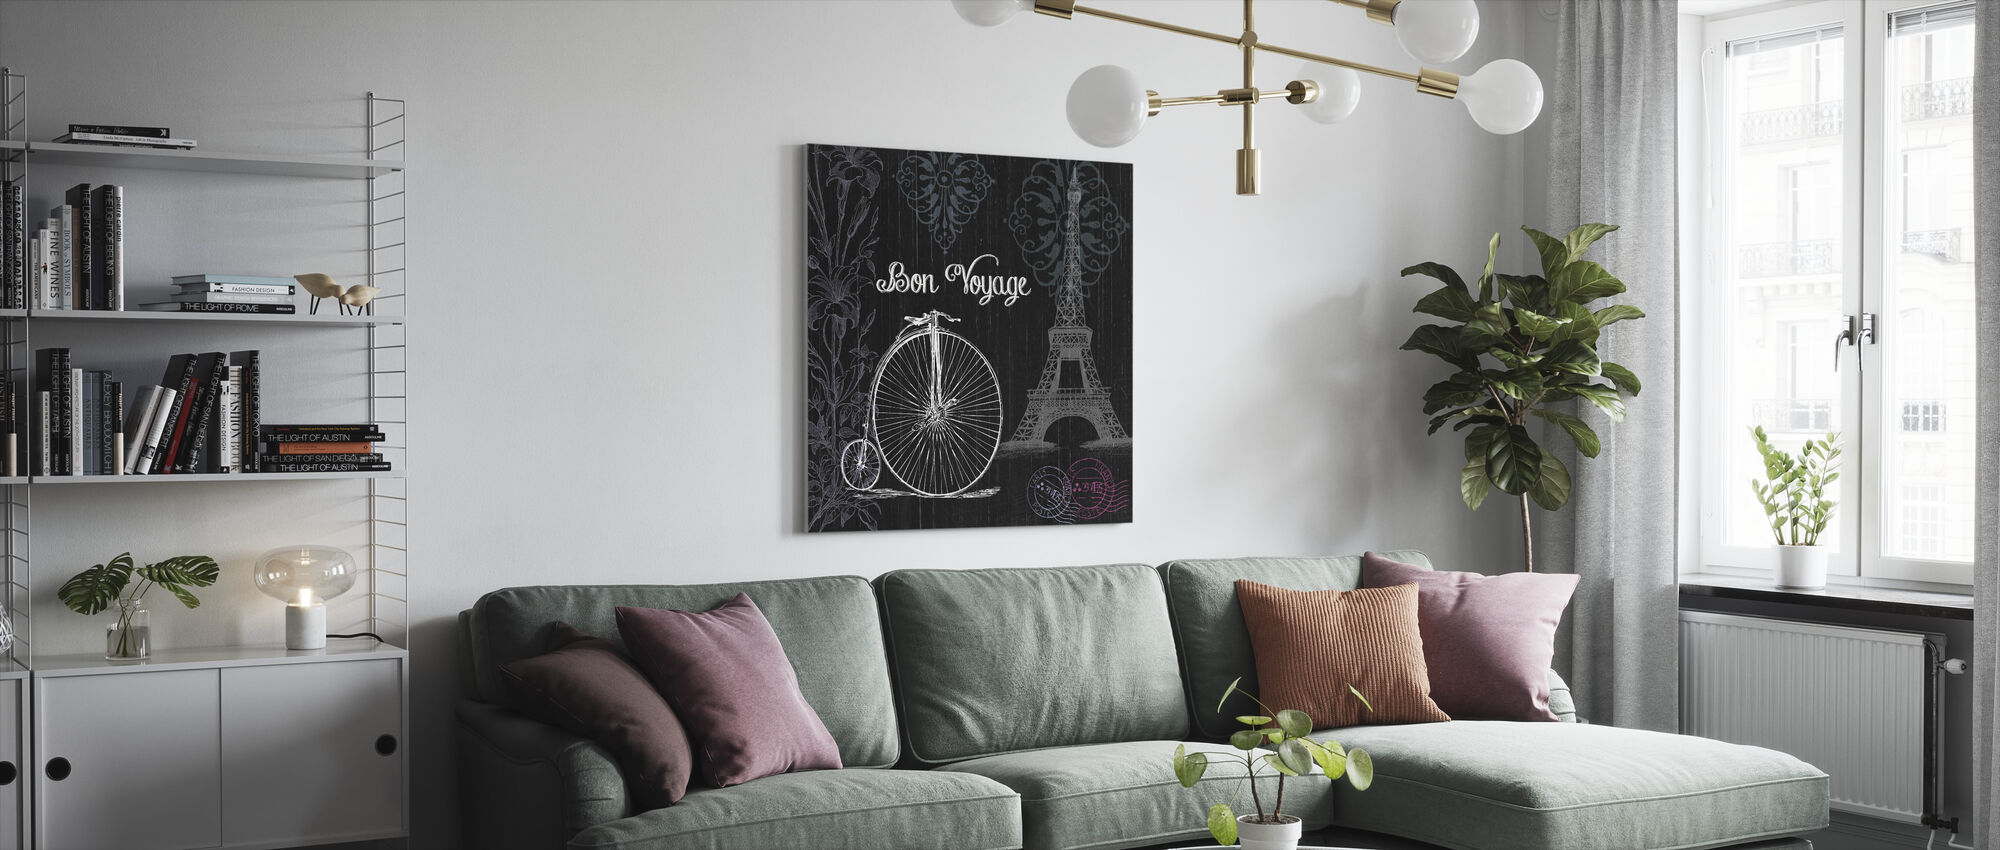 Bon Voyage in Black - Canvas print - Living Room